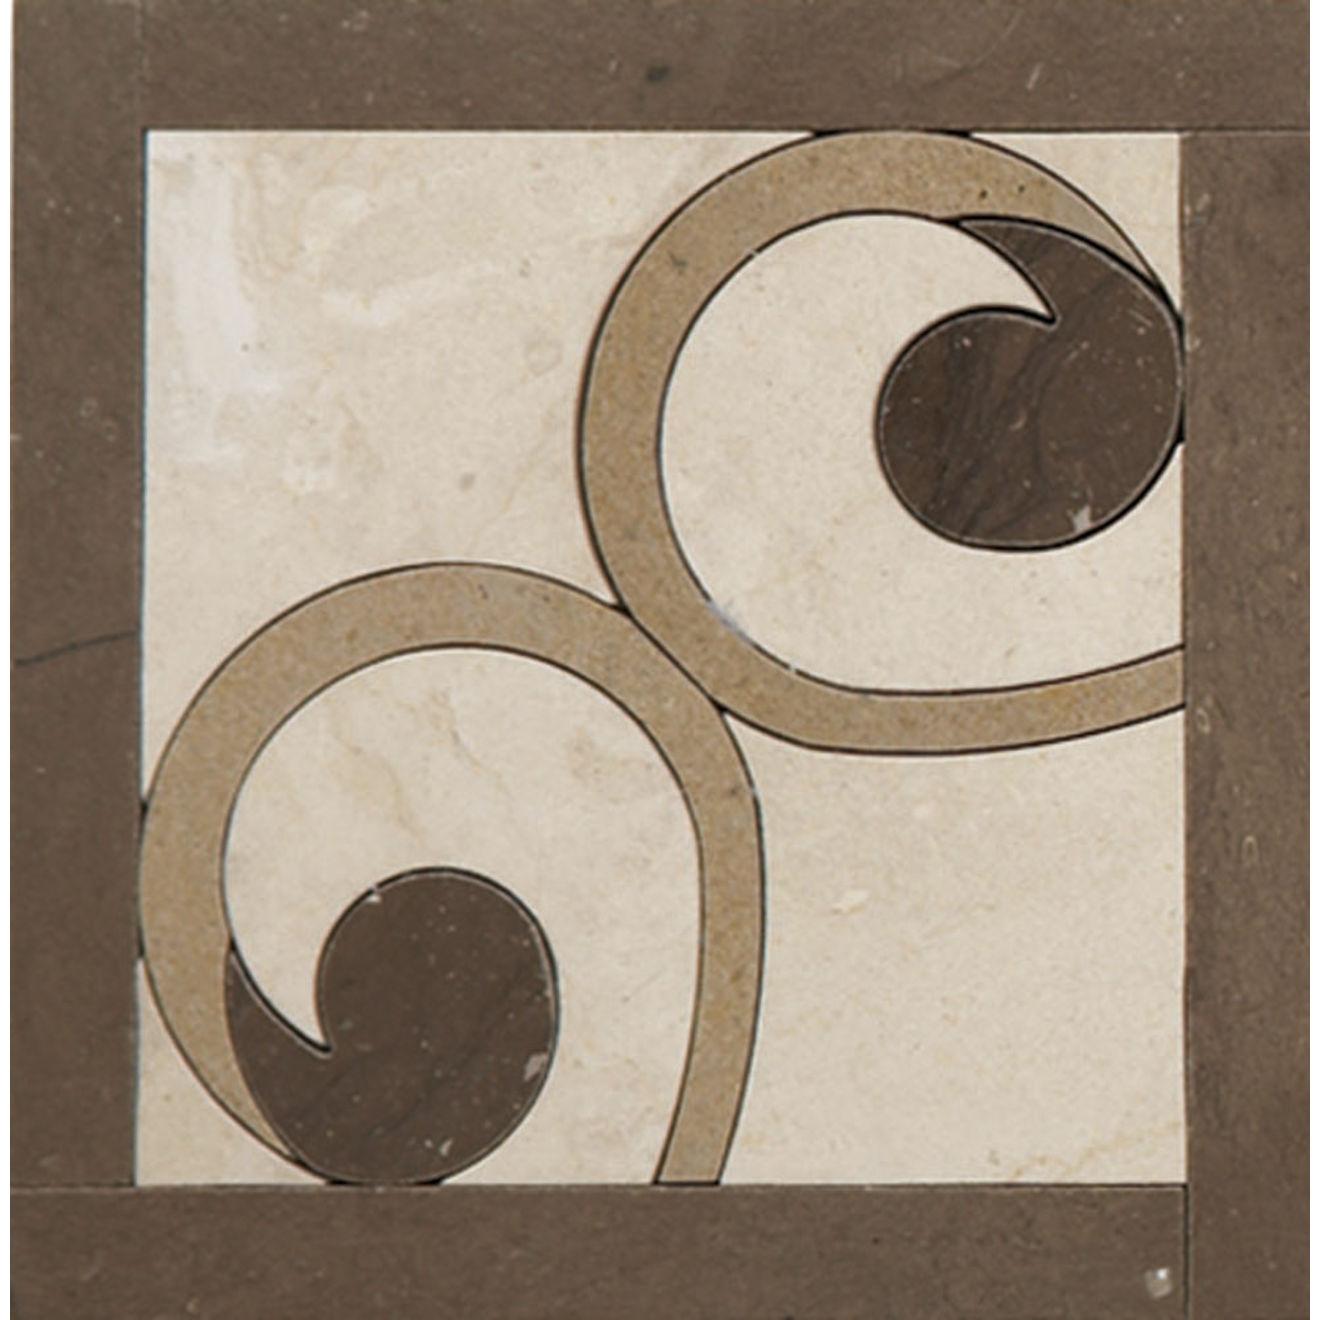 "Suave 4"" x 4"" Decorative Tile in Calacatta, Fleece, Gold, Mink"